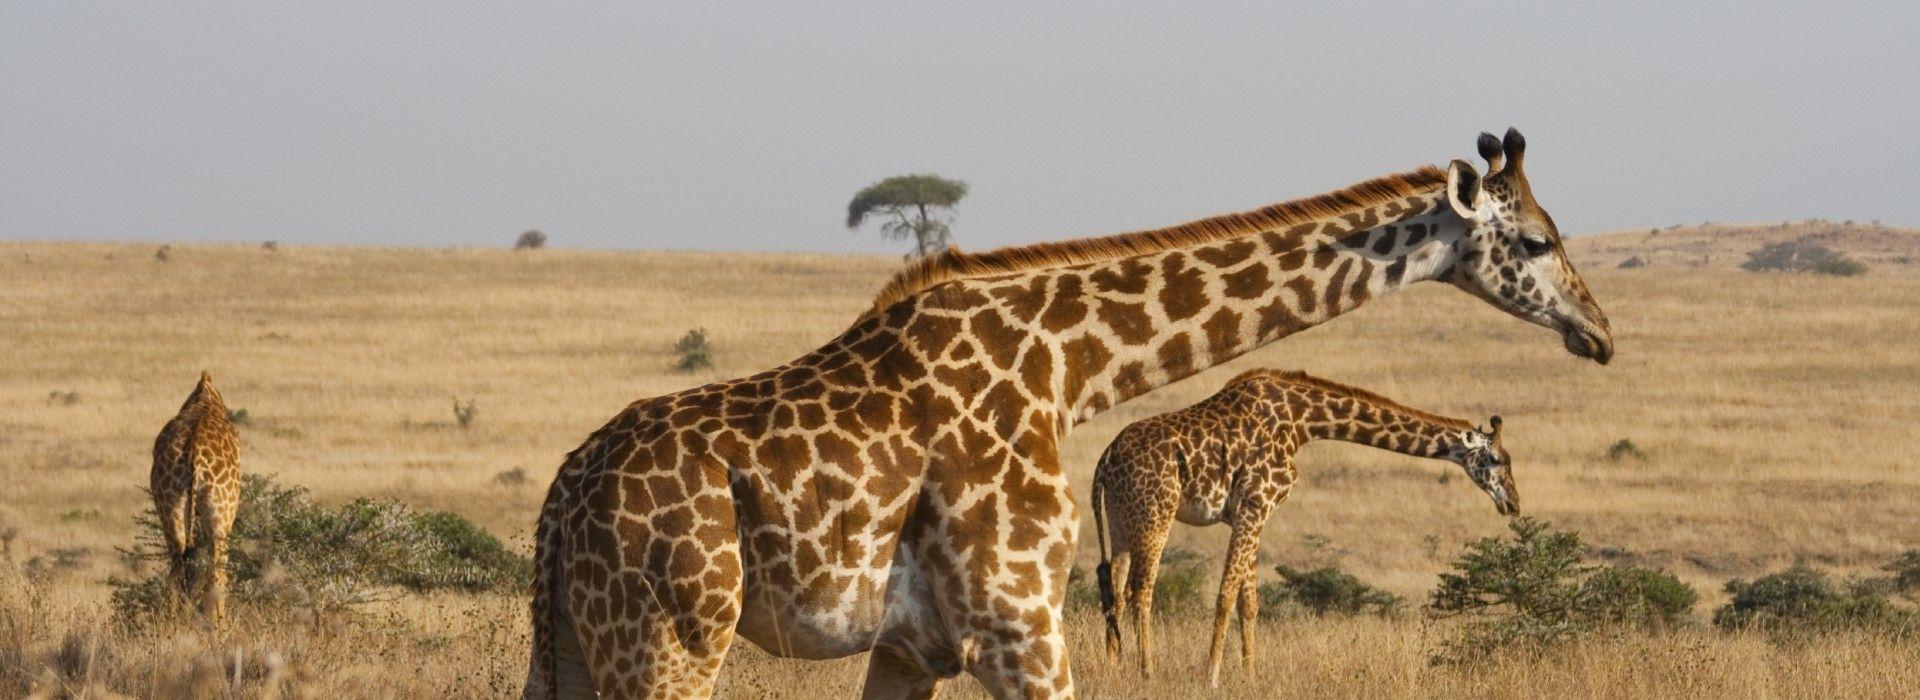 A giraffe family roaming freely at the Nairobi National Park in Kenya